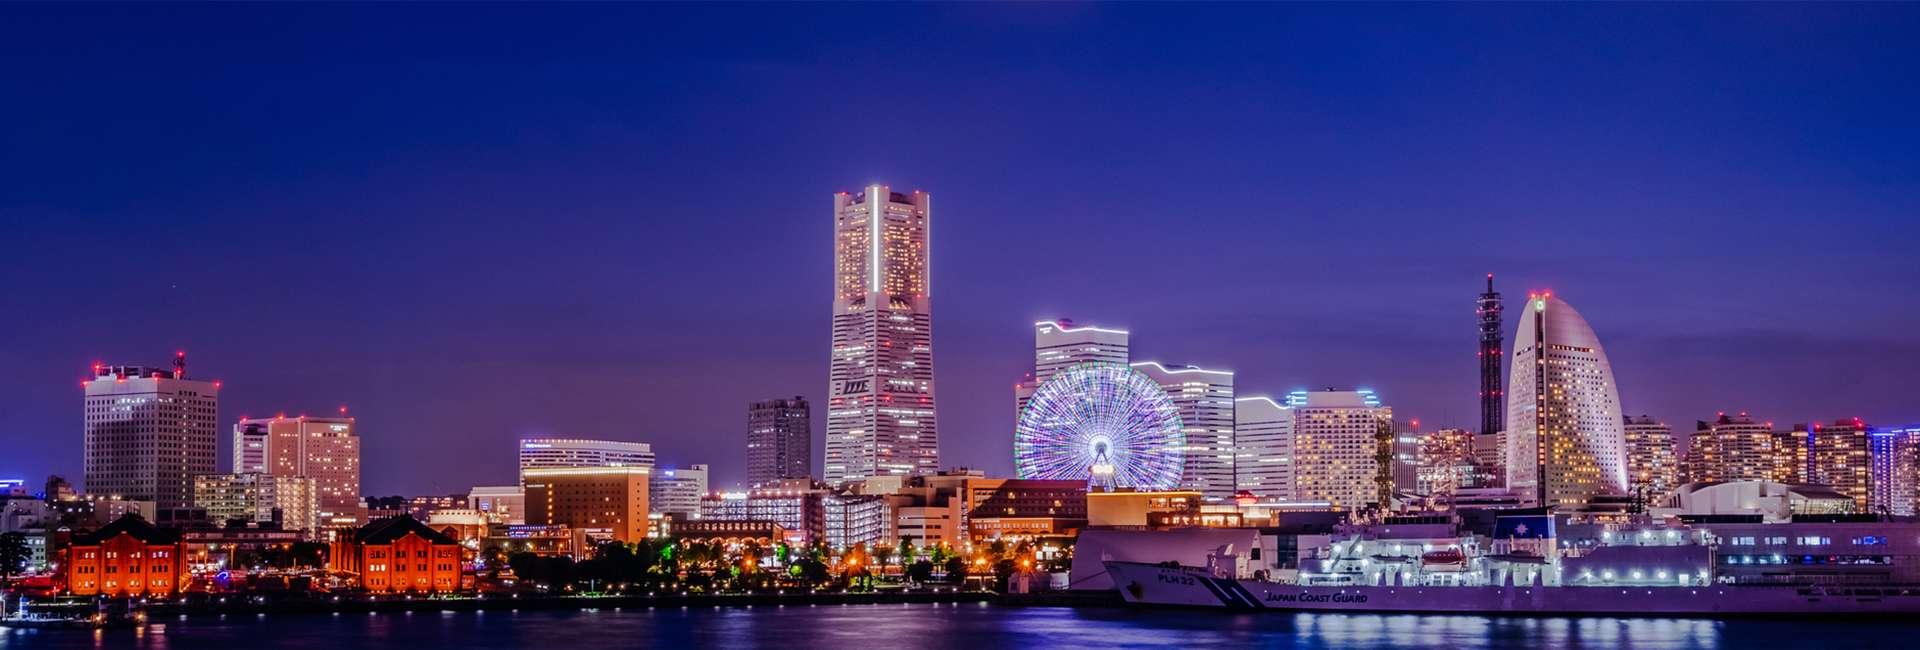 Minato Mirai in Yokohama